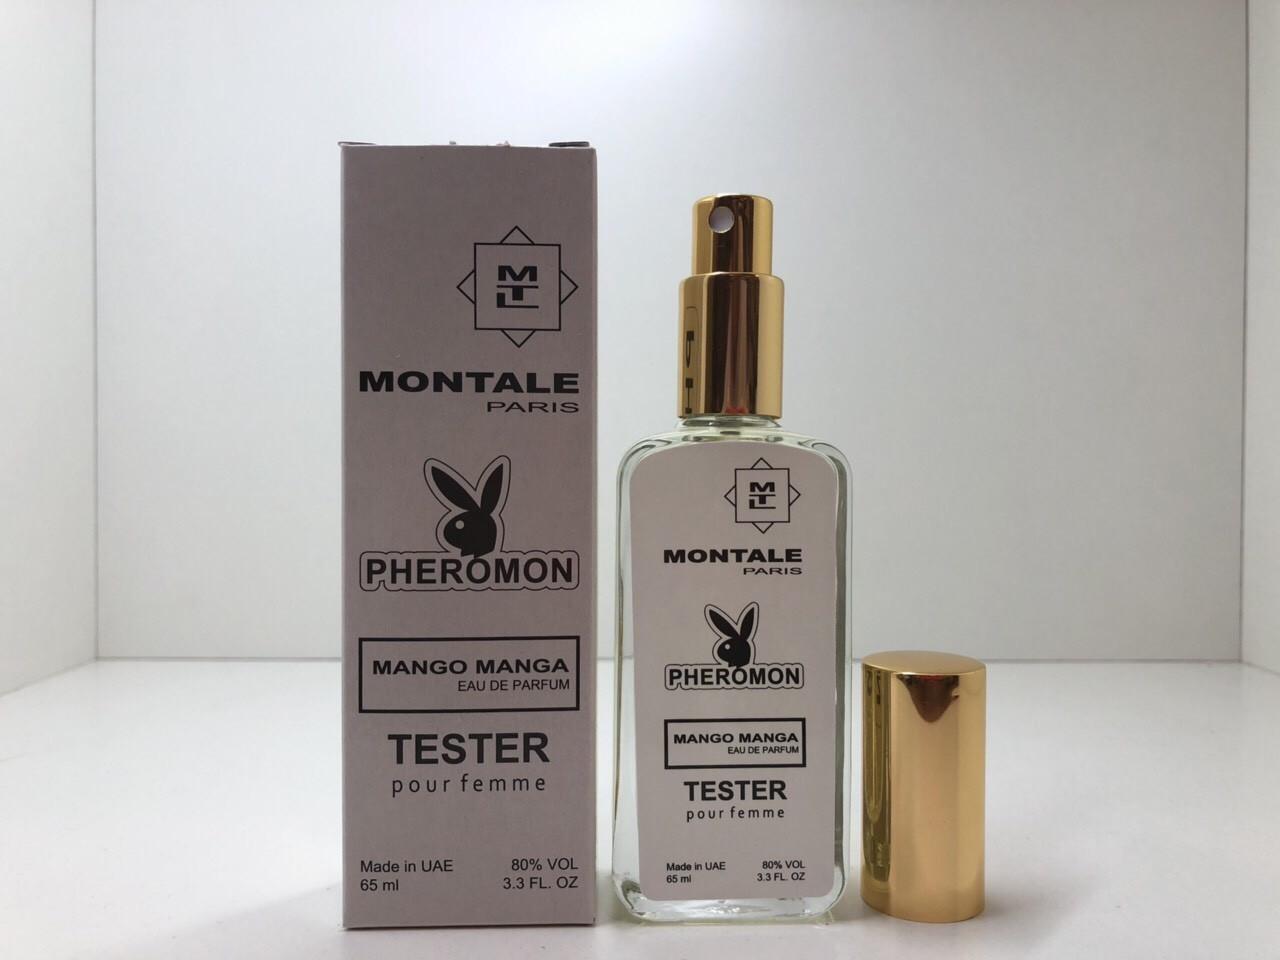 Montale Mango Manga парфюмерия унисекс тестер  с феромонами 65 ml (реплика)